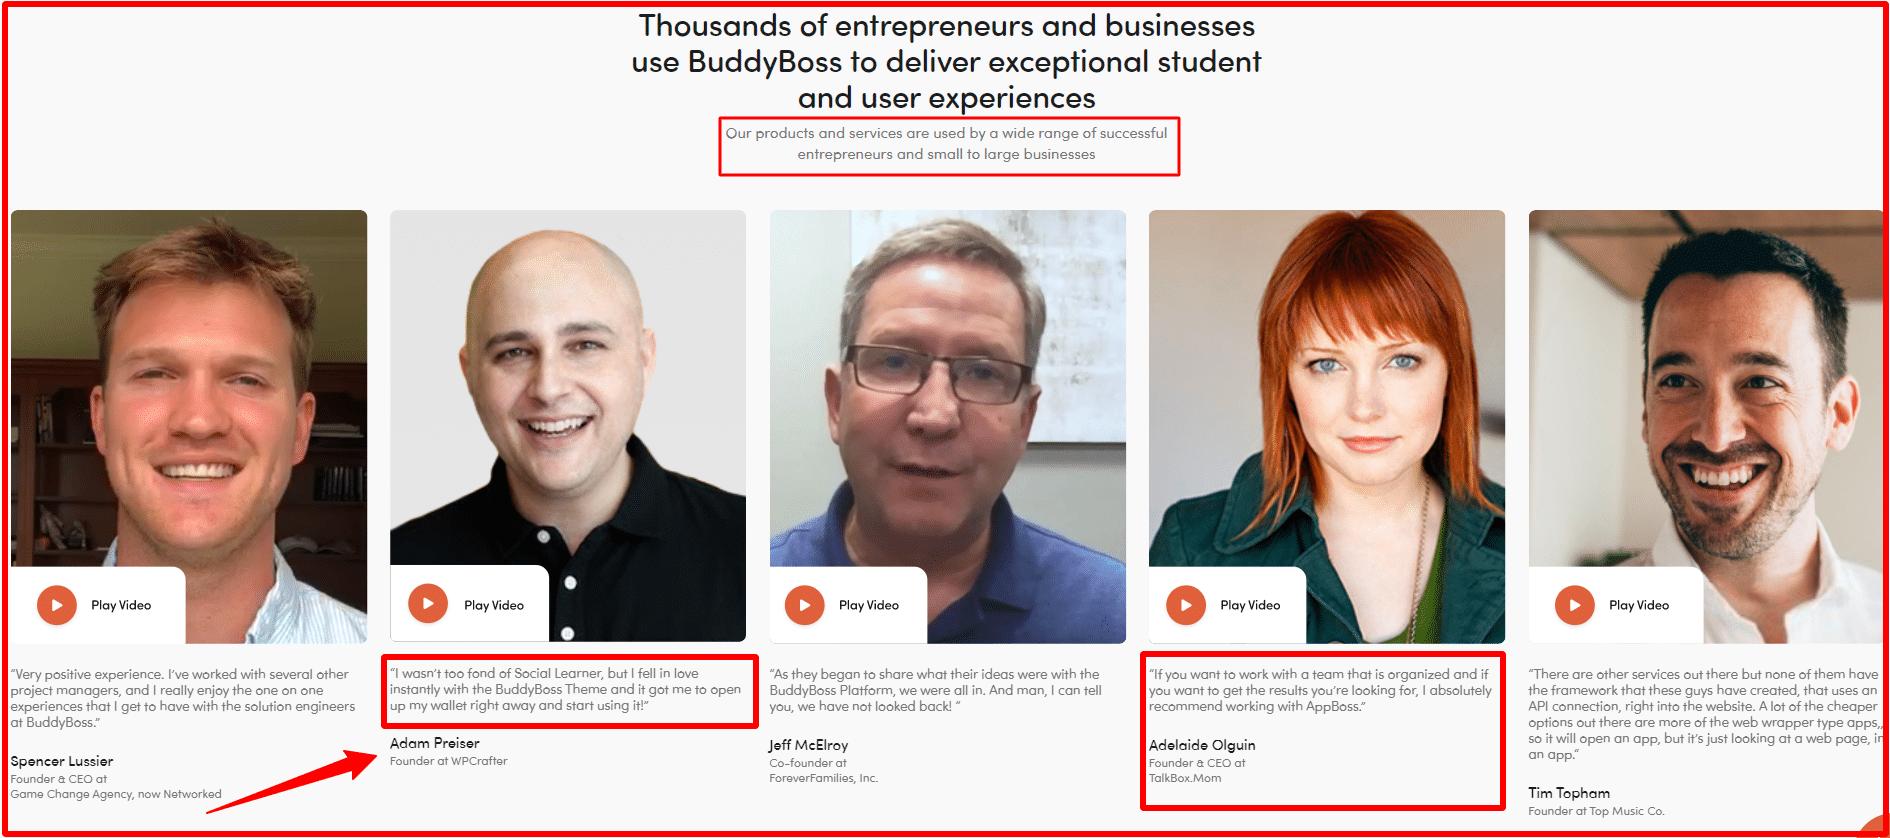 entrepreneurs-and-businesses-use-BuddyBoss